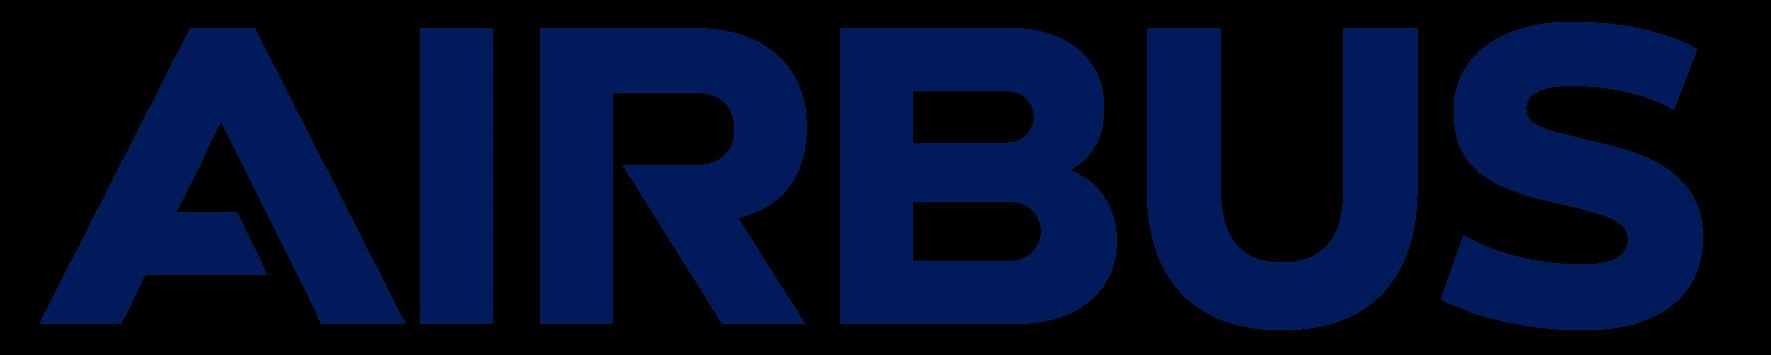 Airbus Operations SAS Logo